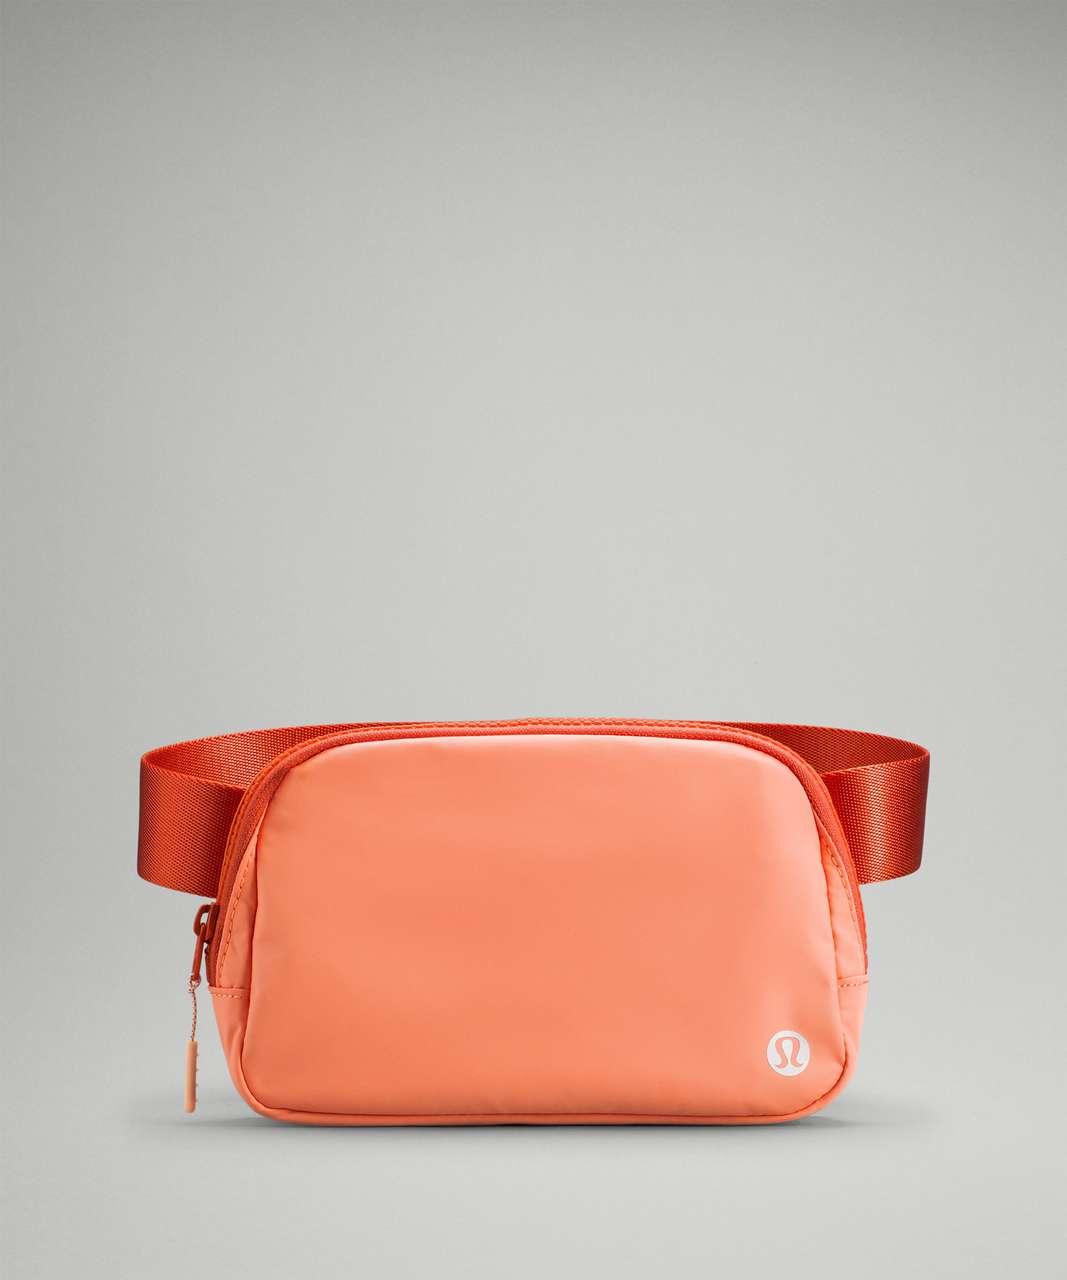 Lululemon Everywhere Belt Bag *1L - Golden Apricot / Warm Coral